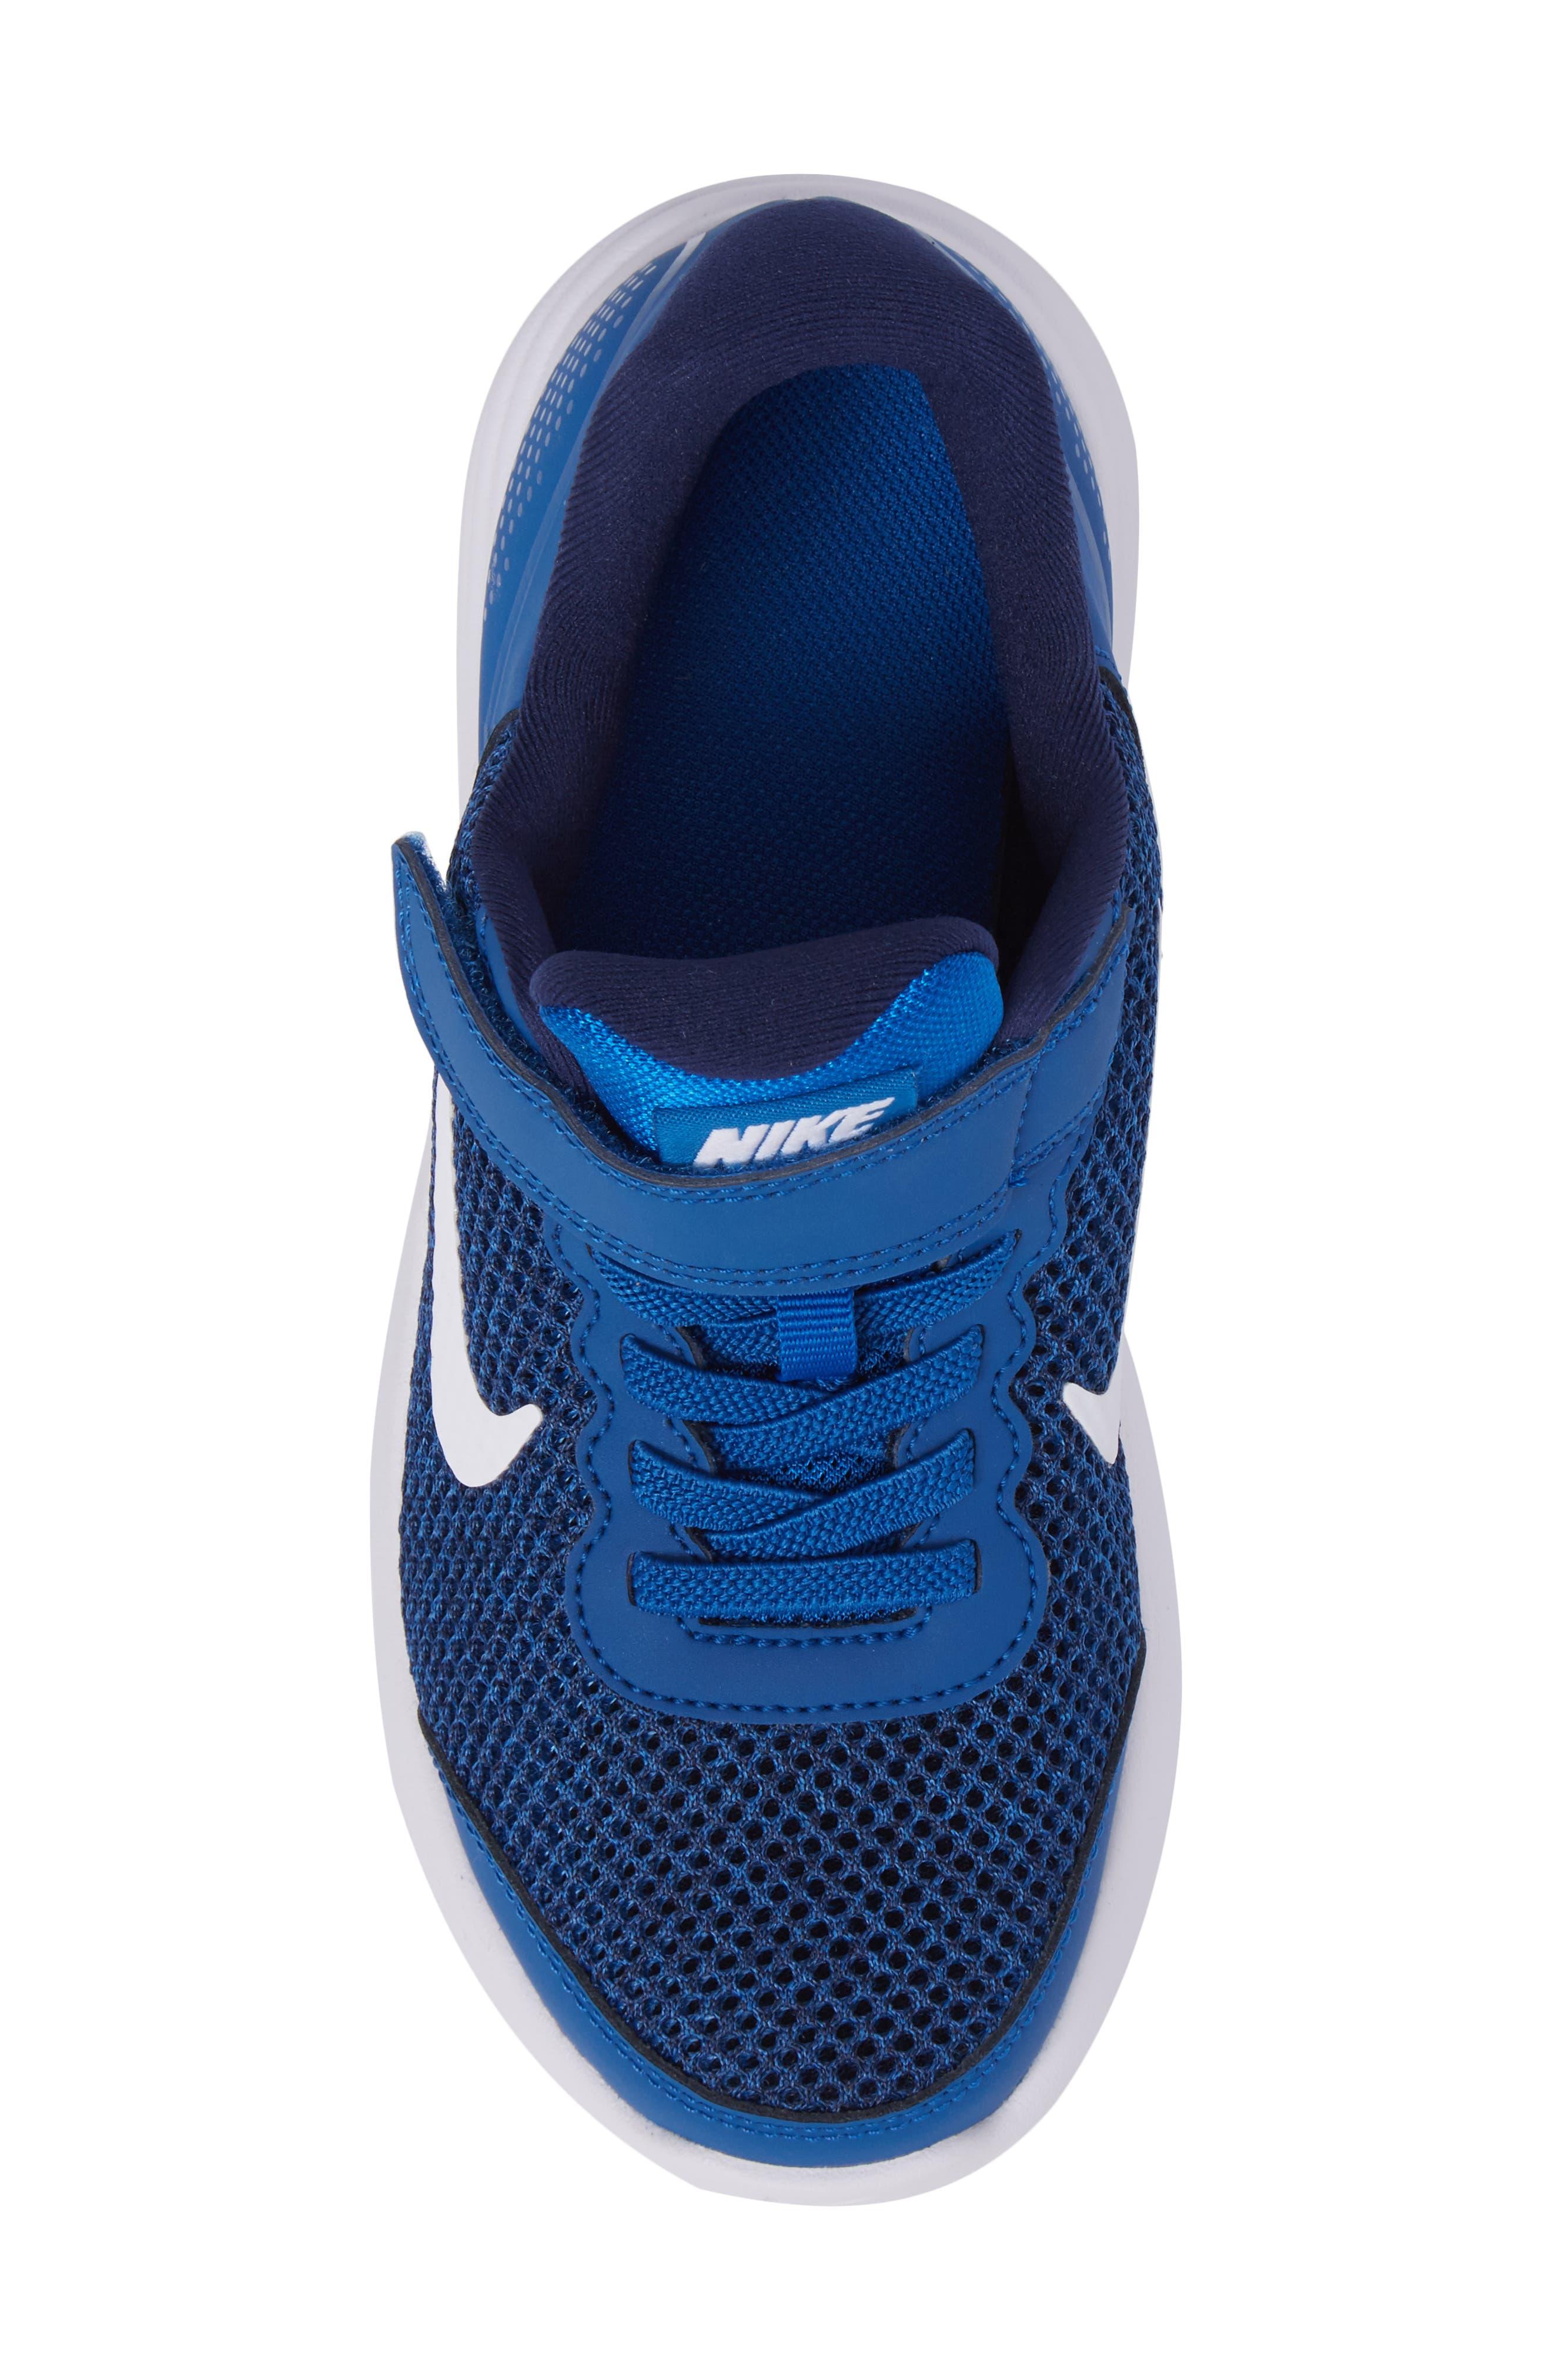 Lunar Apparent Sneaker,                             Alternate thumbnail 5, color,                             Blue Jay/ White/ Binary Blue